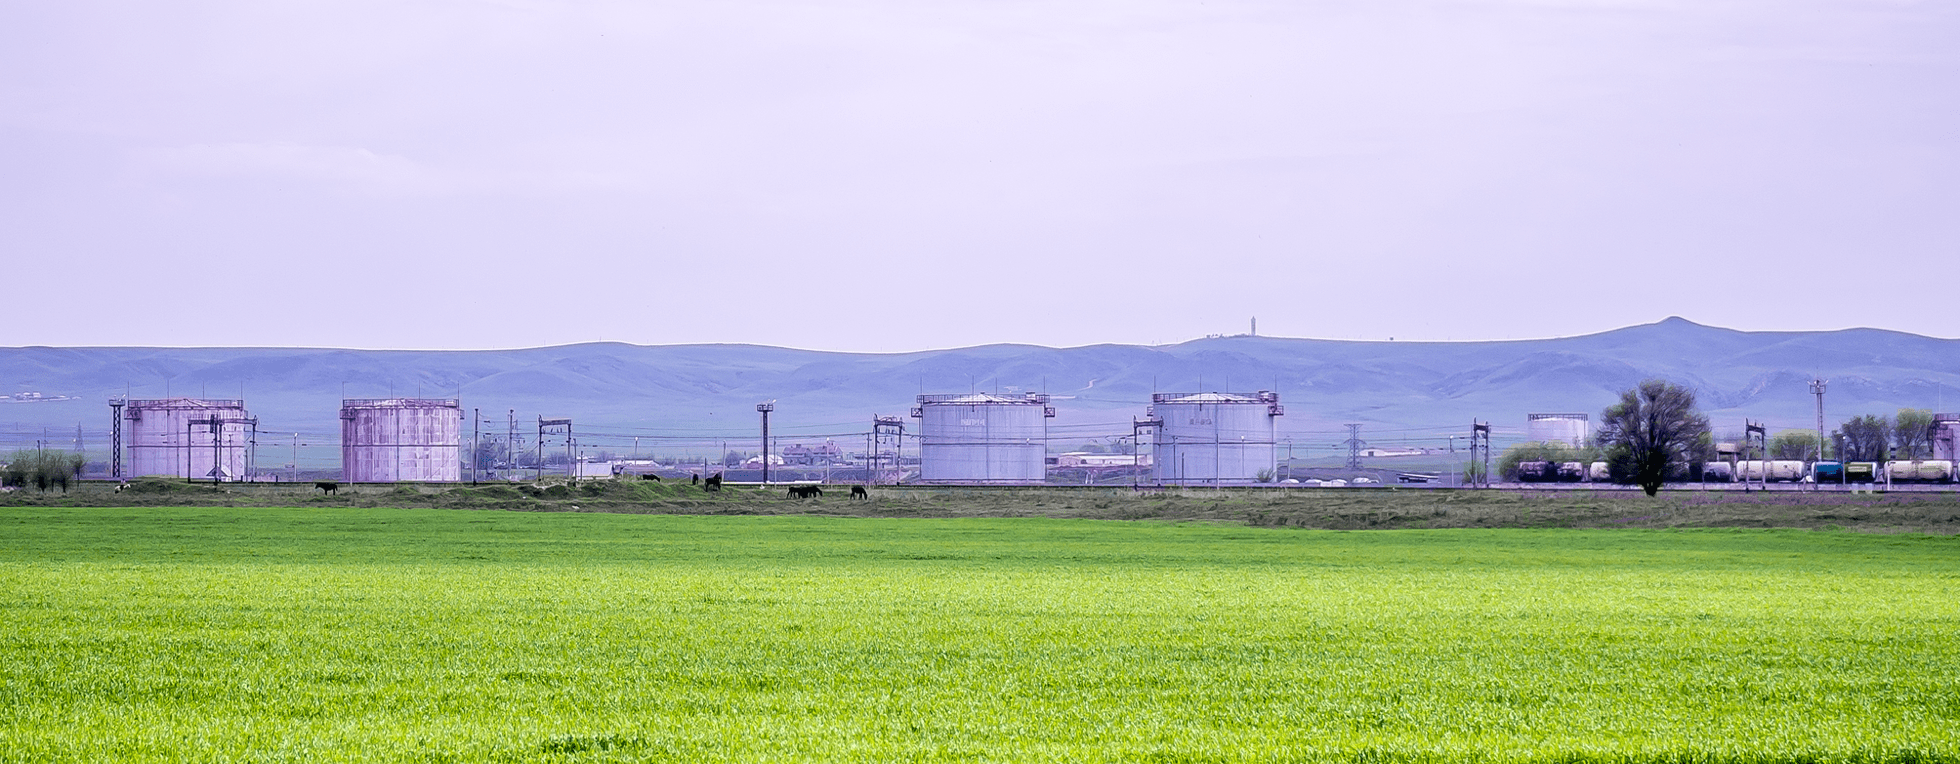 Global's Easton Energy Investment